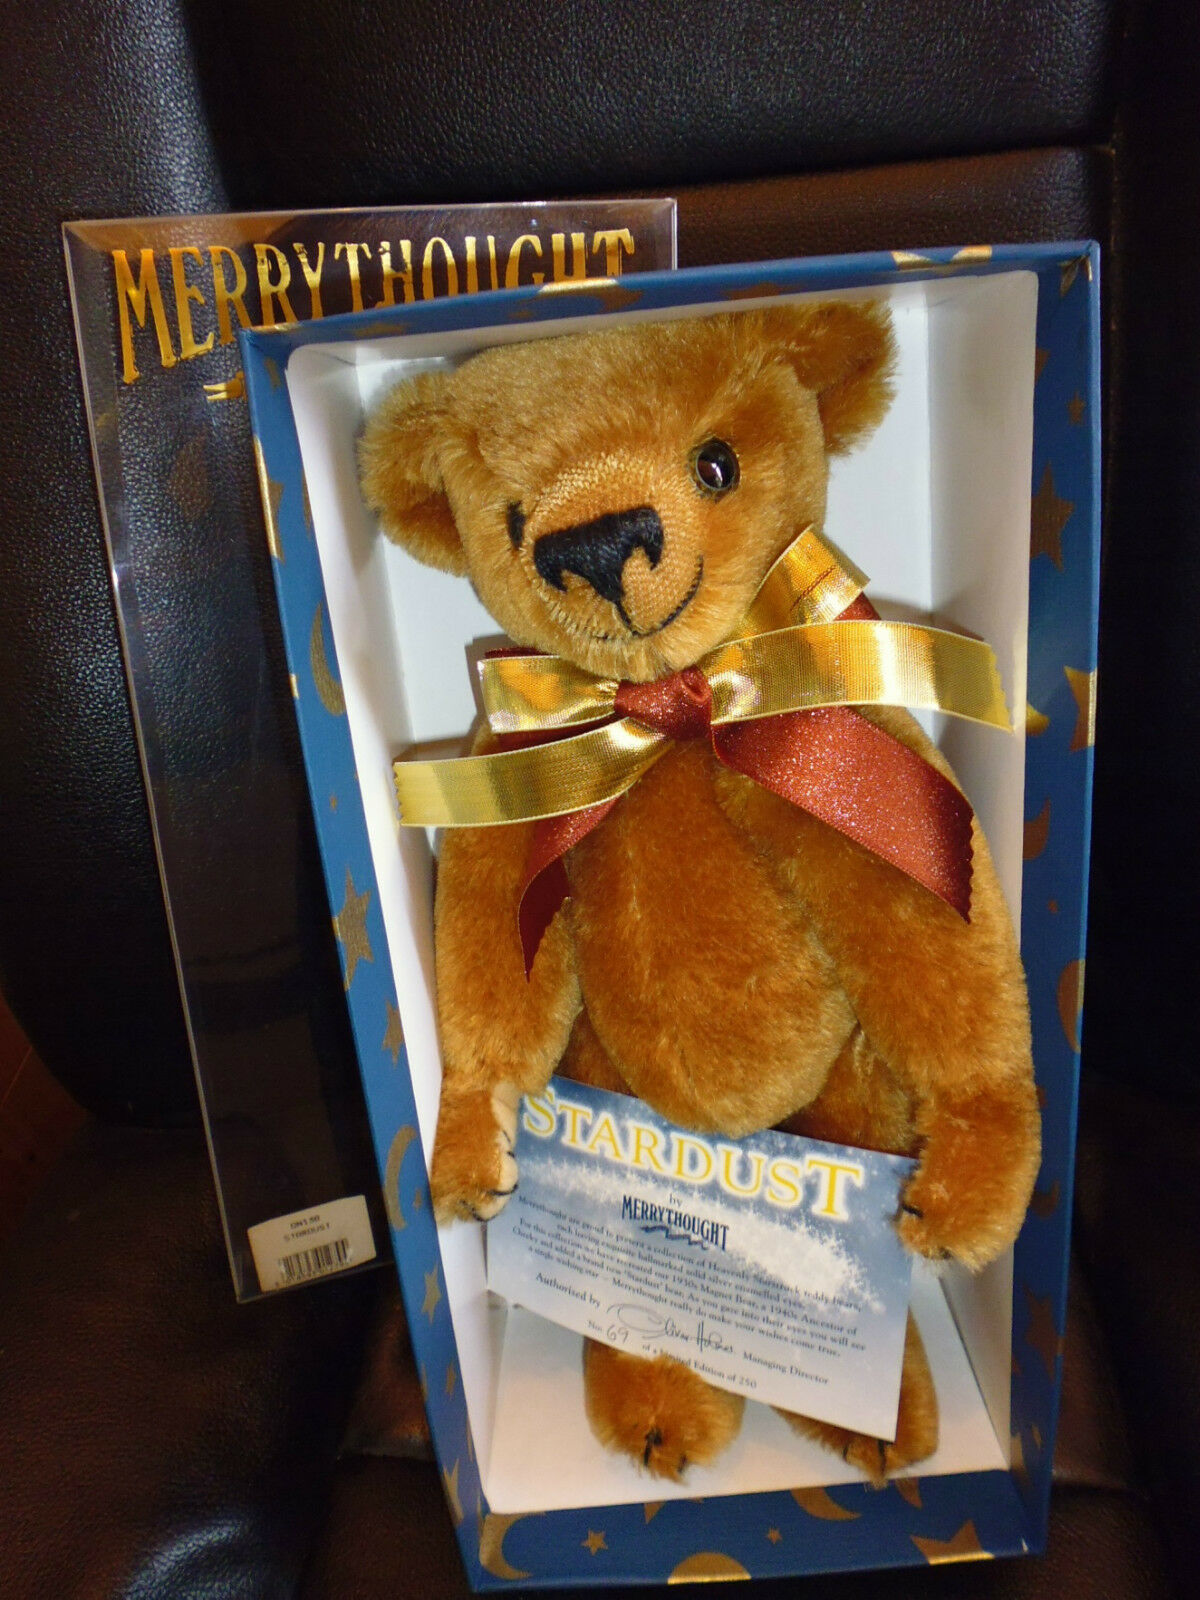 Merrythought on13b Stardust Teddy Bear Ltd 69 di 250 nuove 33 cm